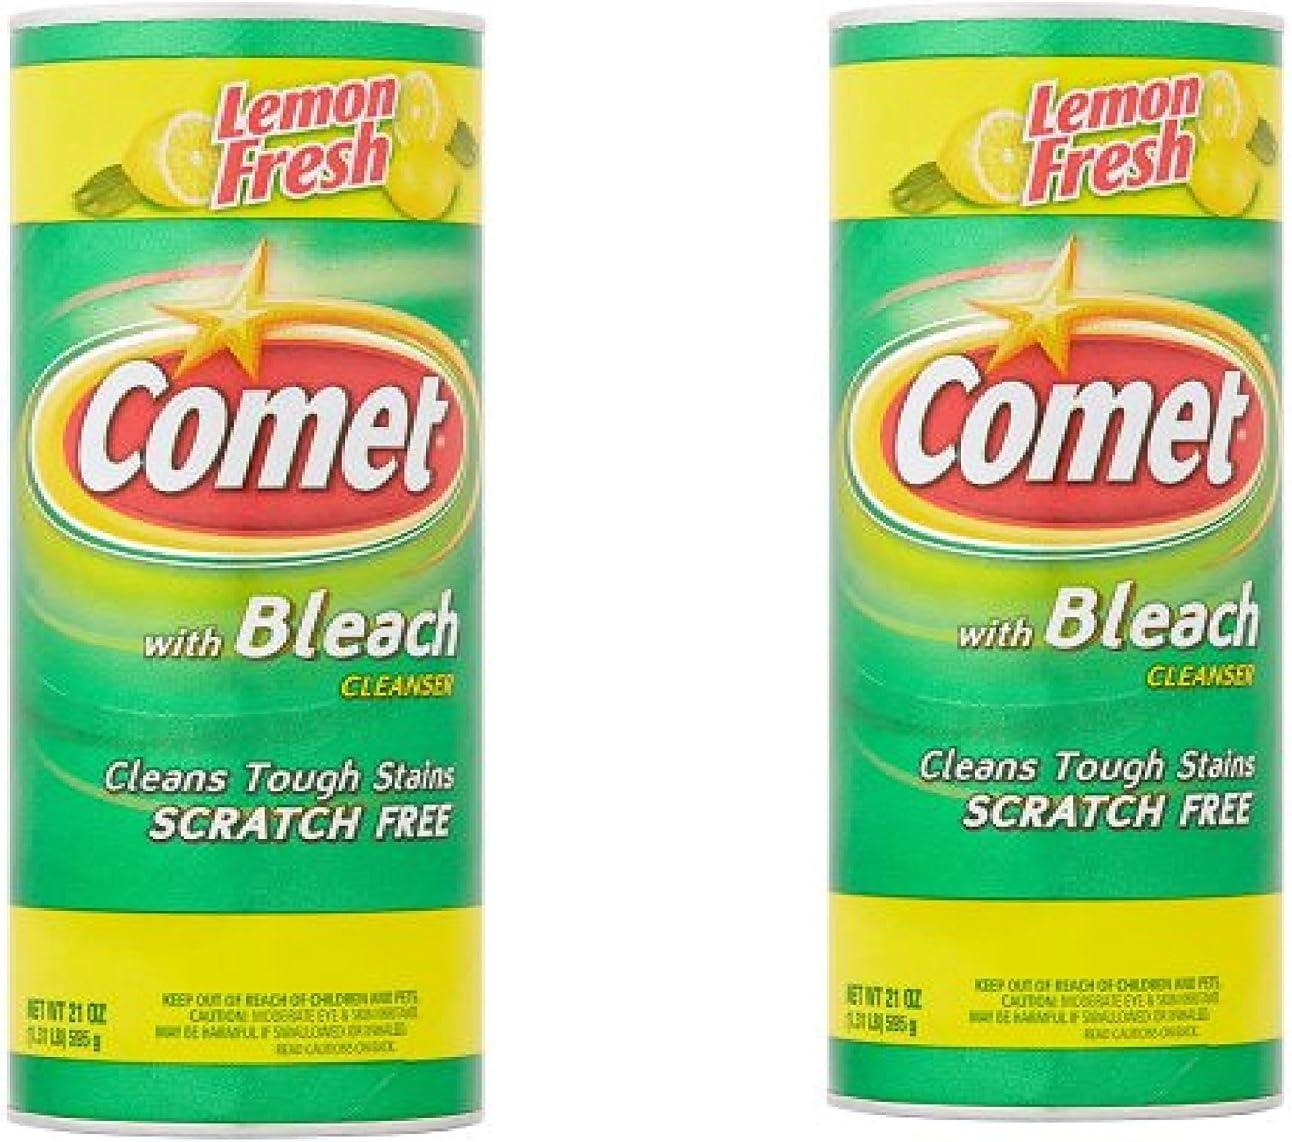 Lemon Fresh with Bleach Cleaner, 21oz Pack of 2